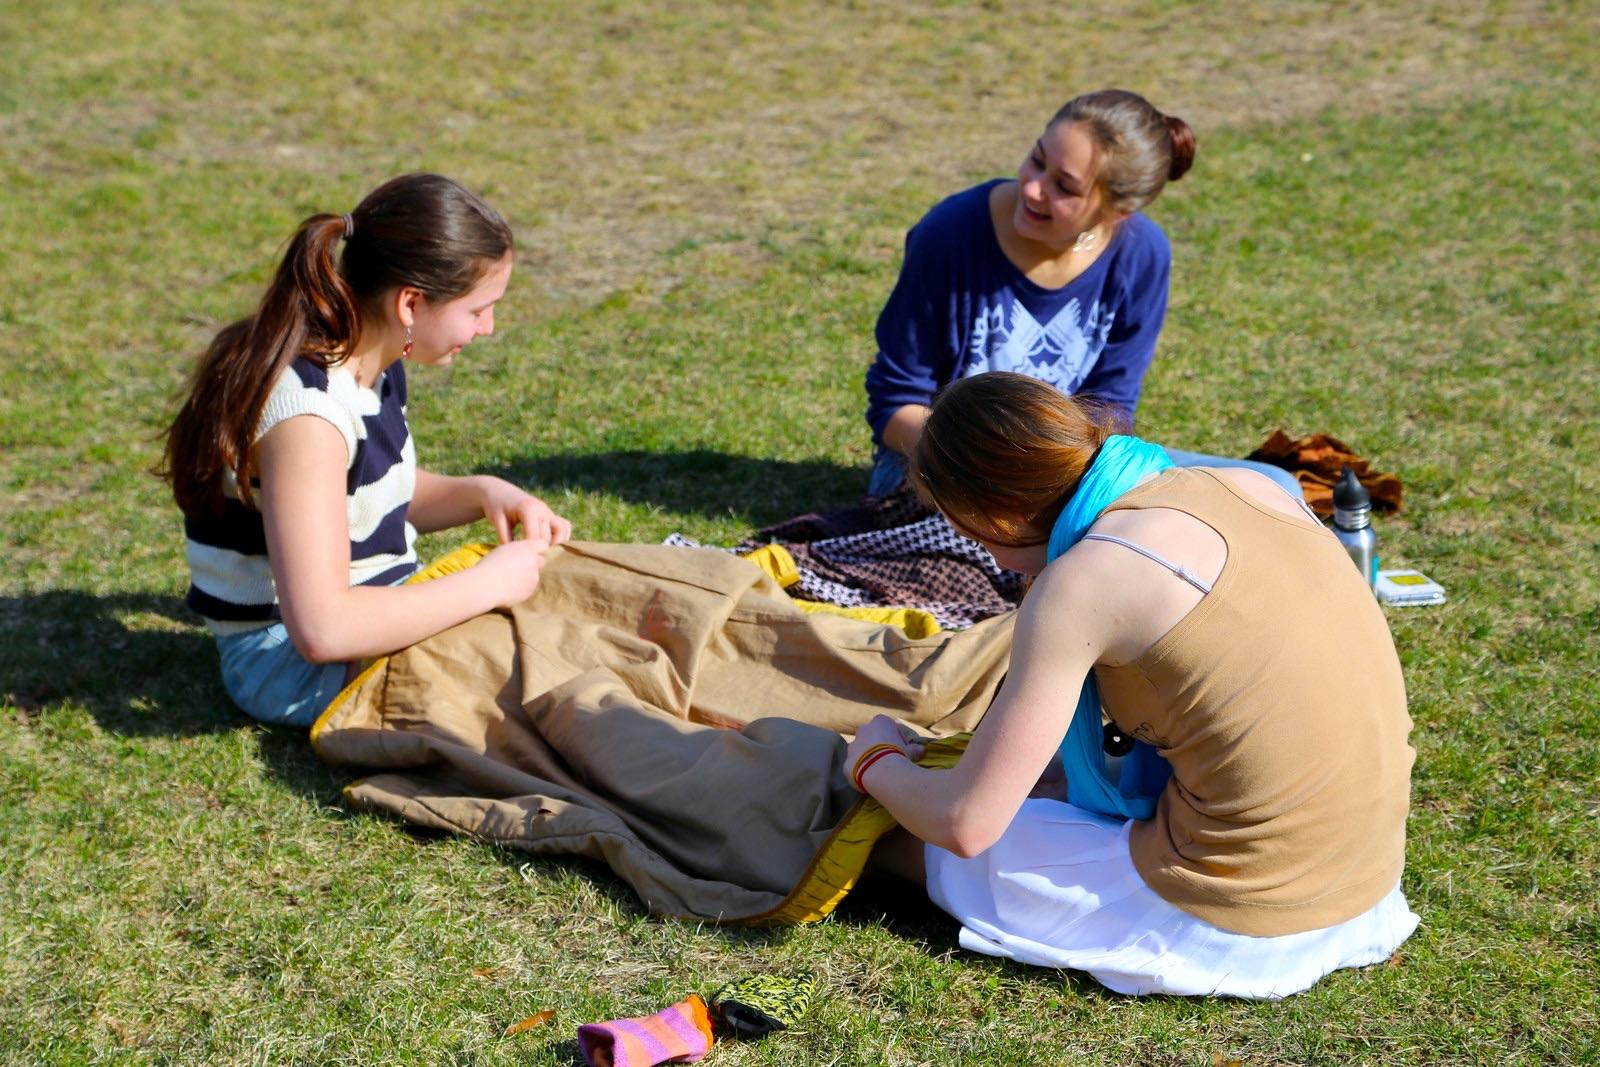 trio sew on grass.jpg